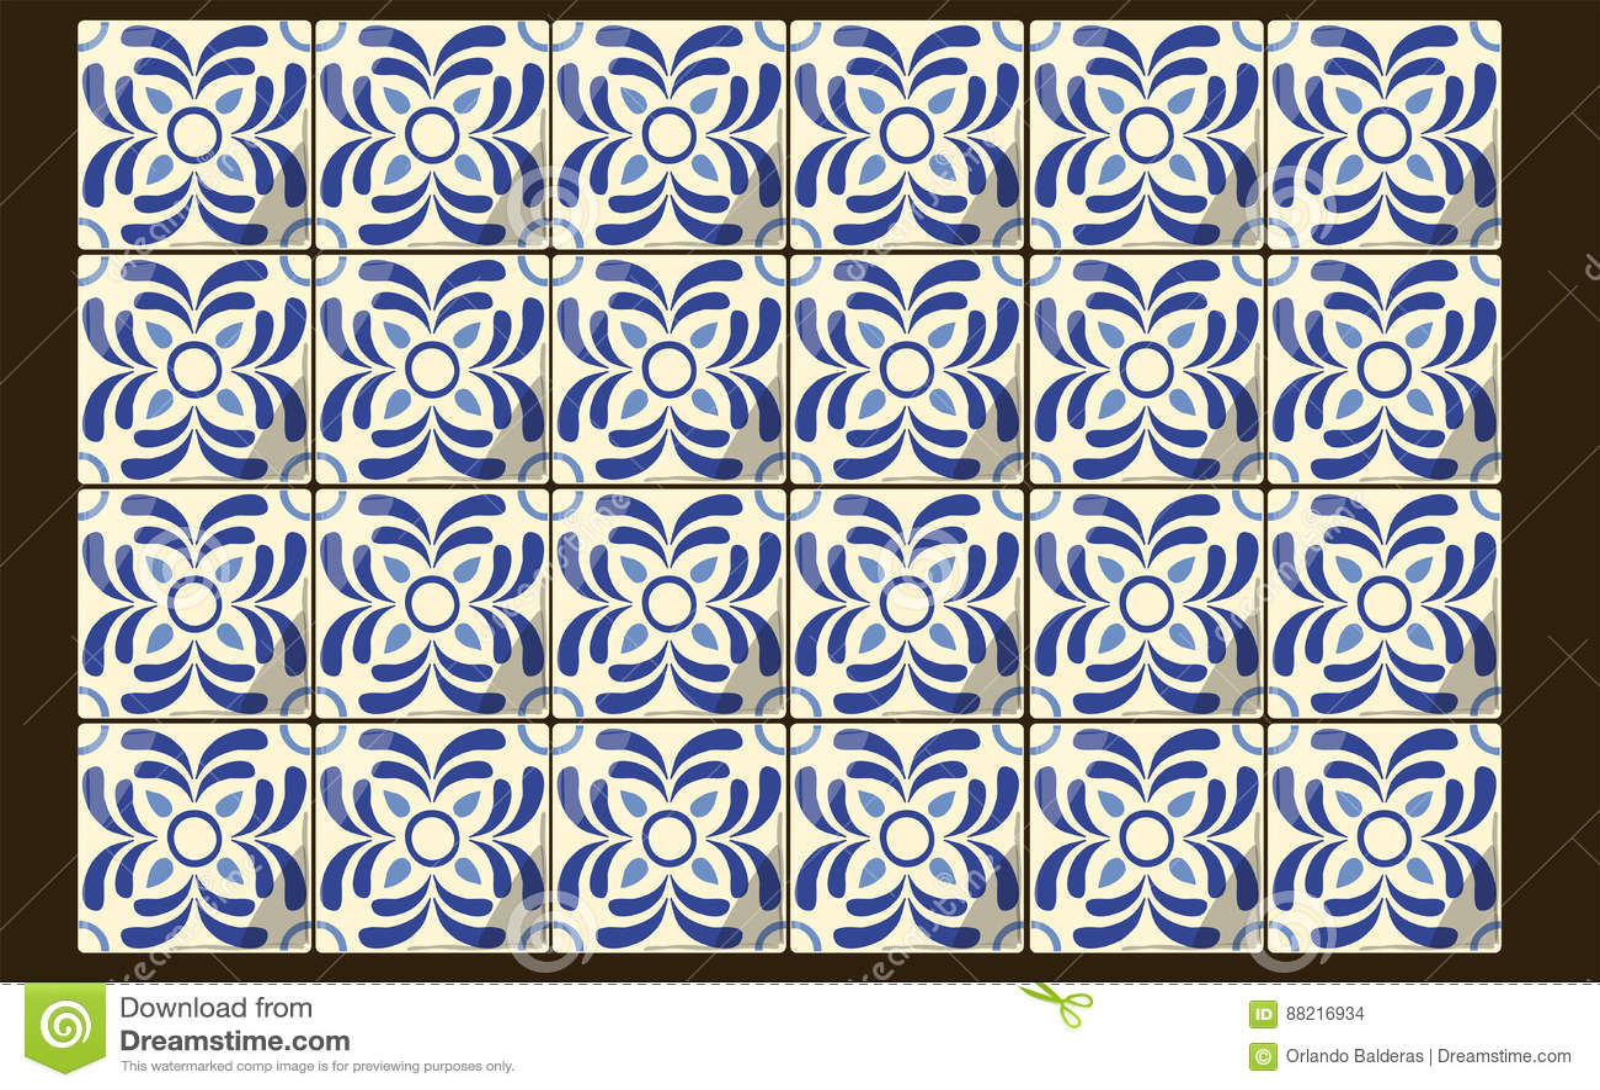 Meksykańskie błękit płytki